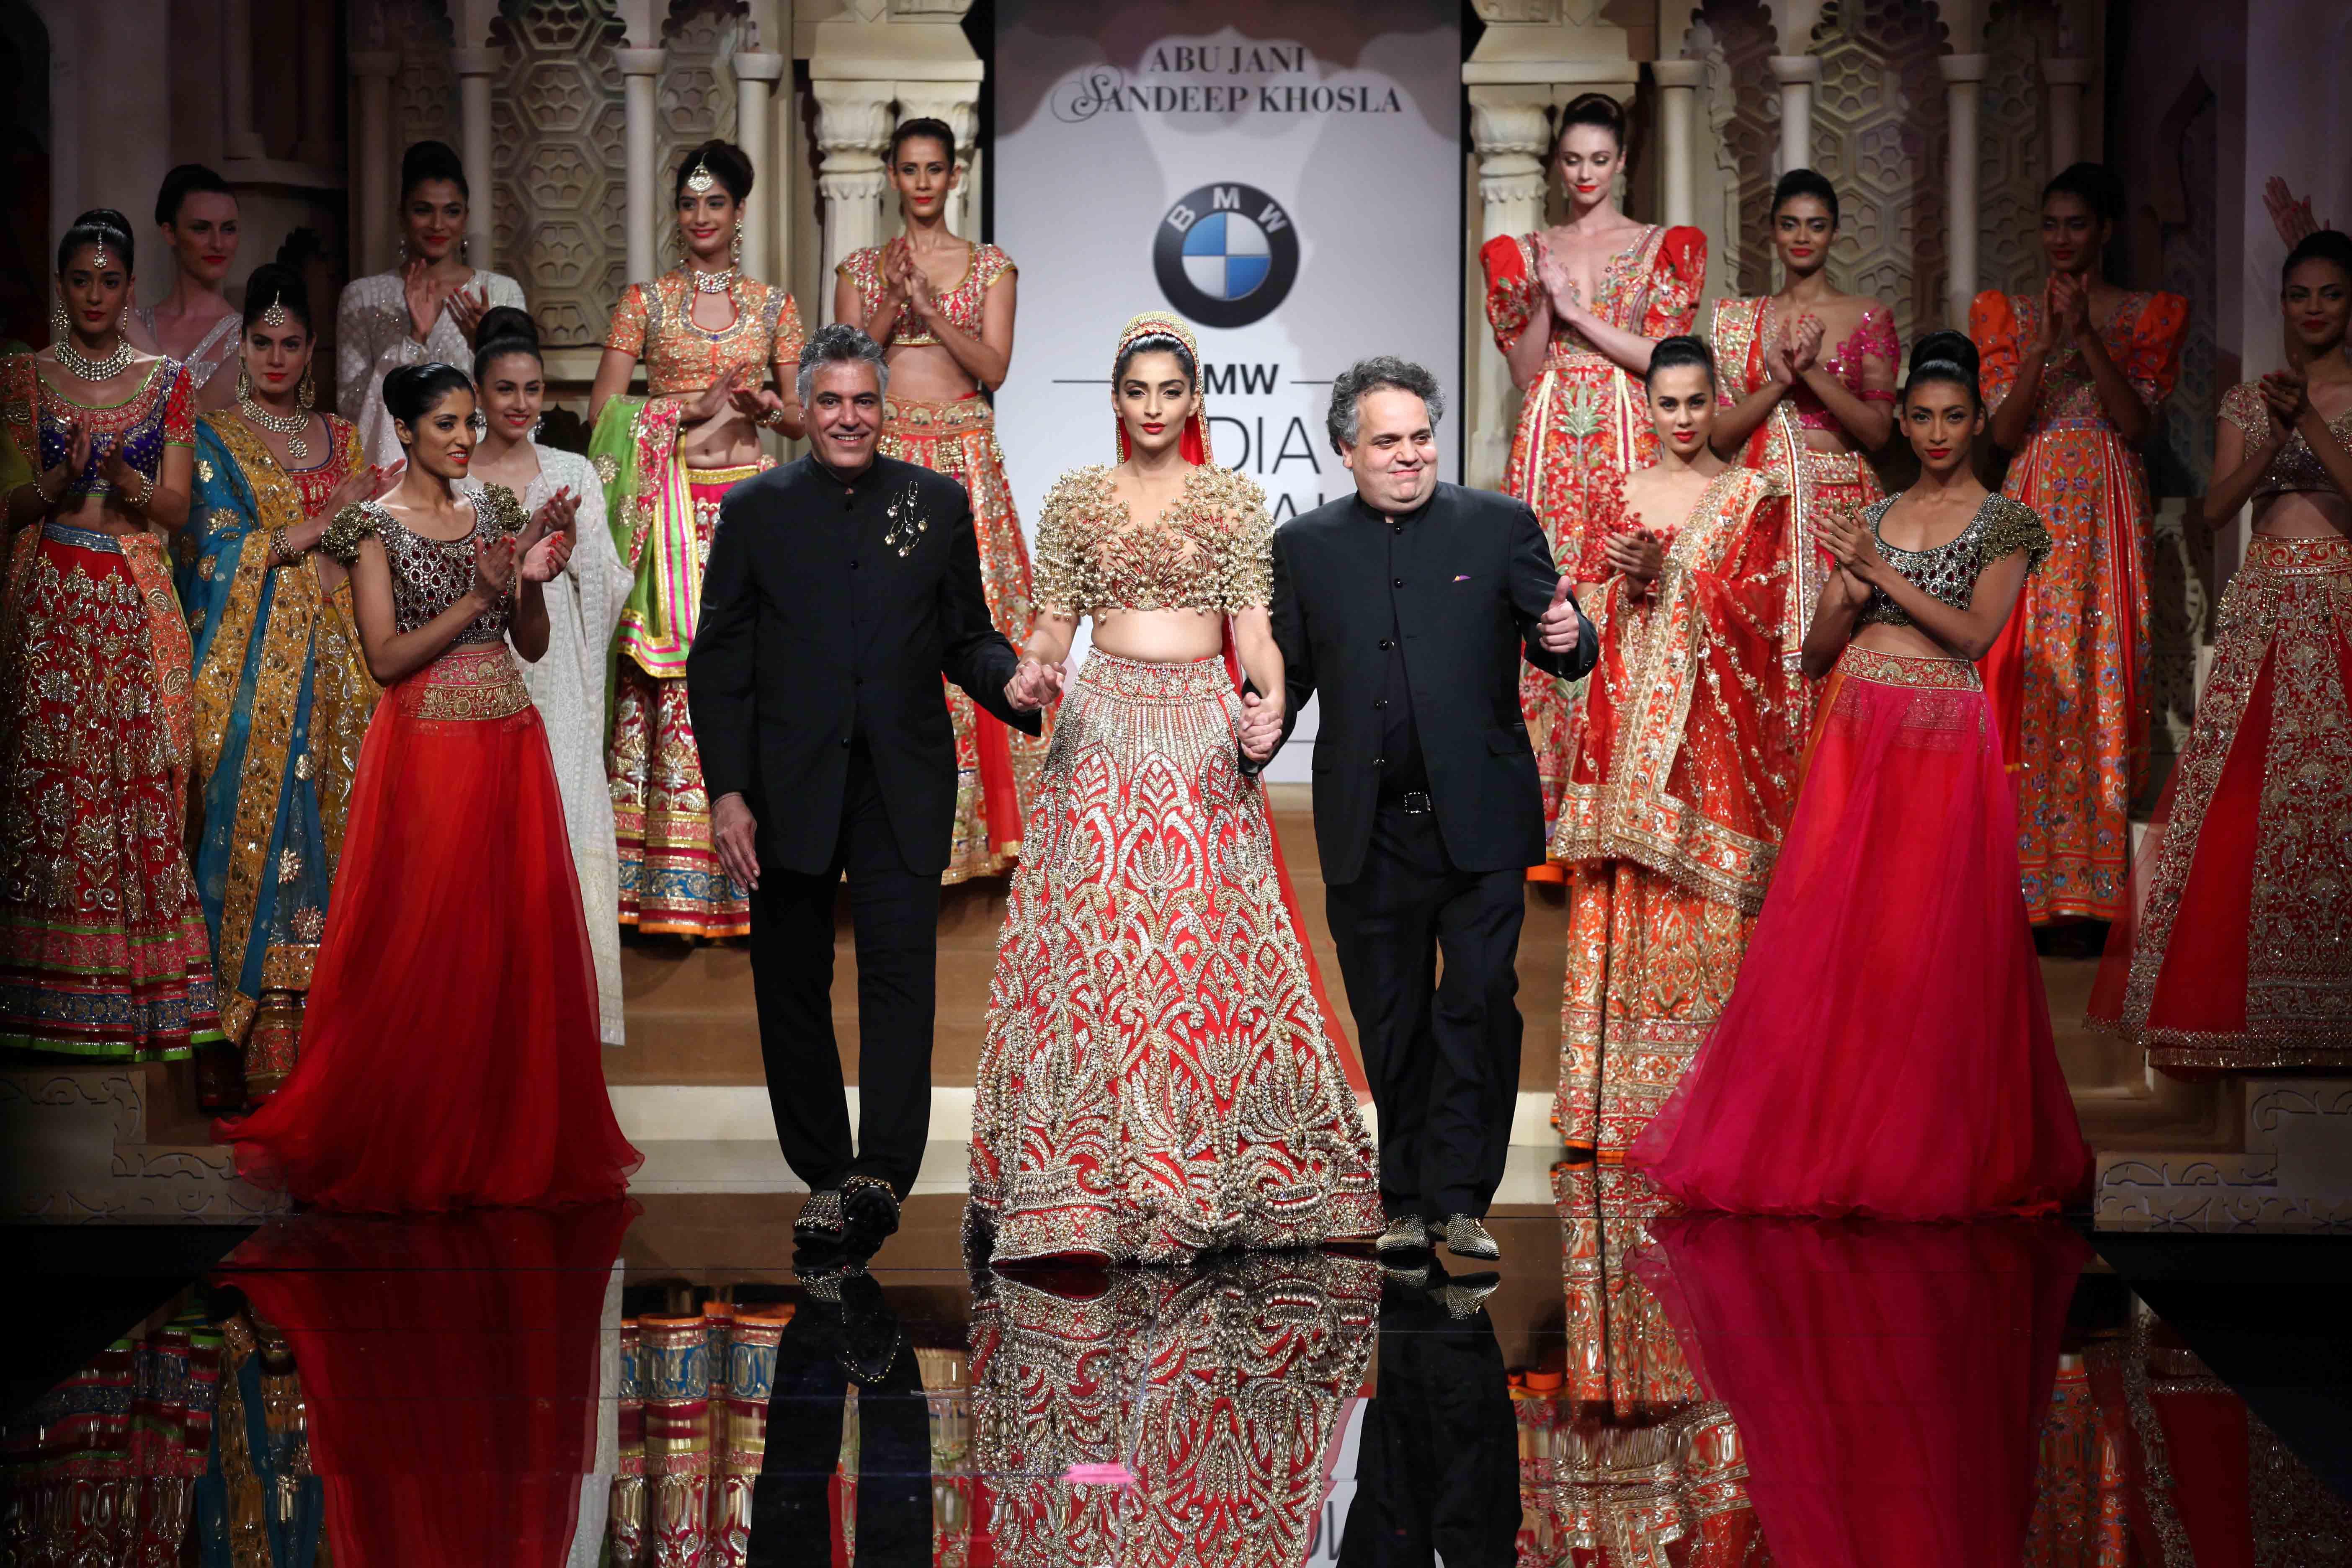 Sonam Kapoor in Abu Jani Sandeep Khosla at the opening of BMW IBFW